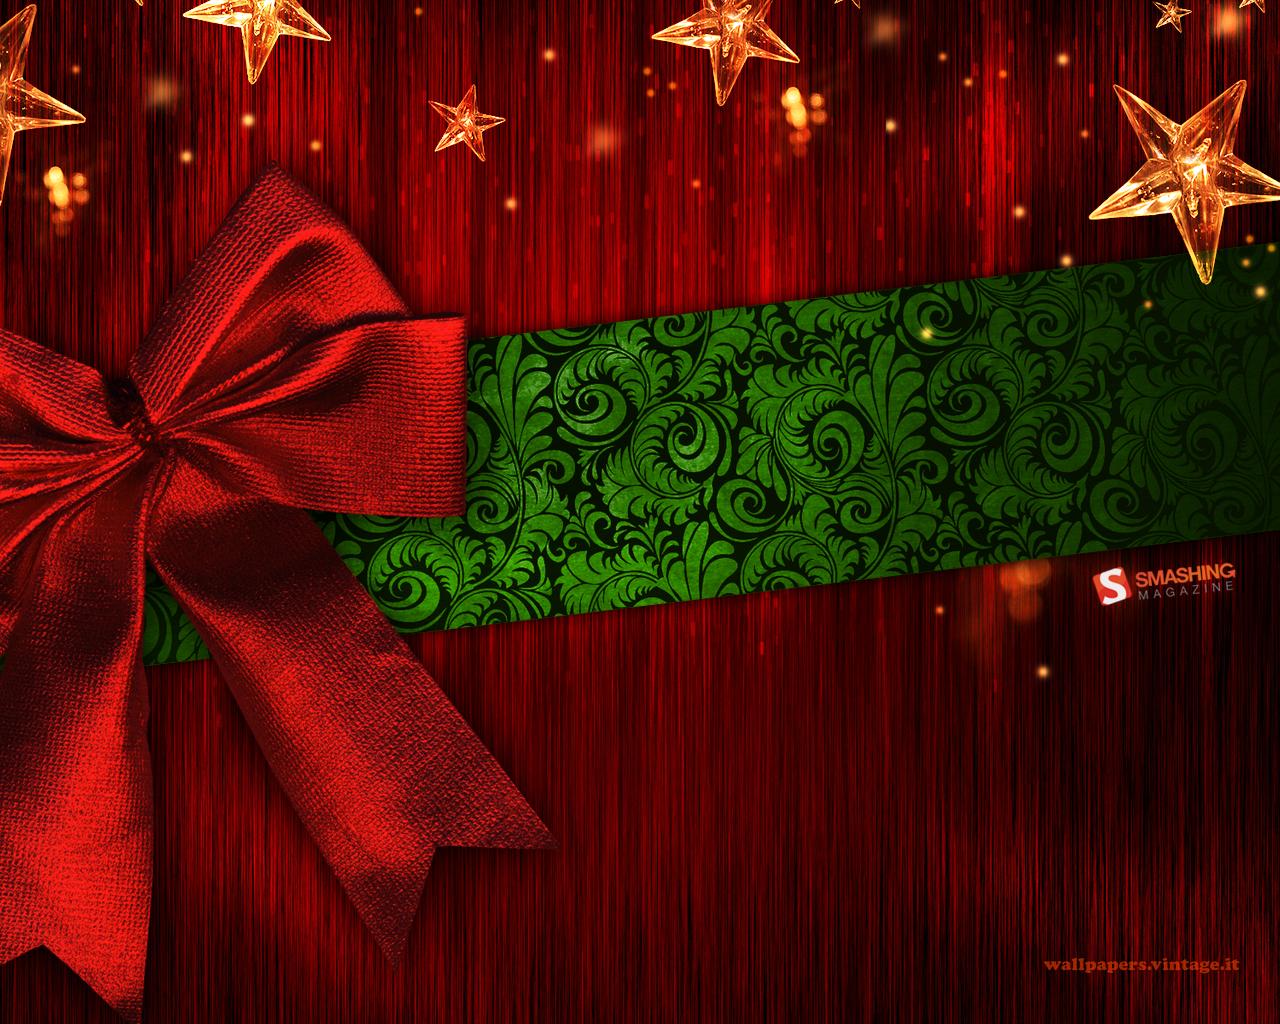 Free Ipad Wallpaper Christmas: Christmas Wallpaper